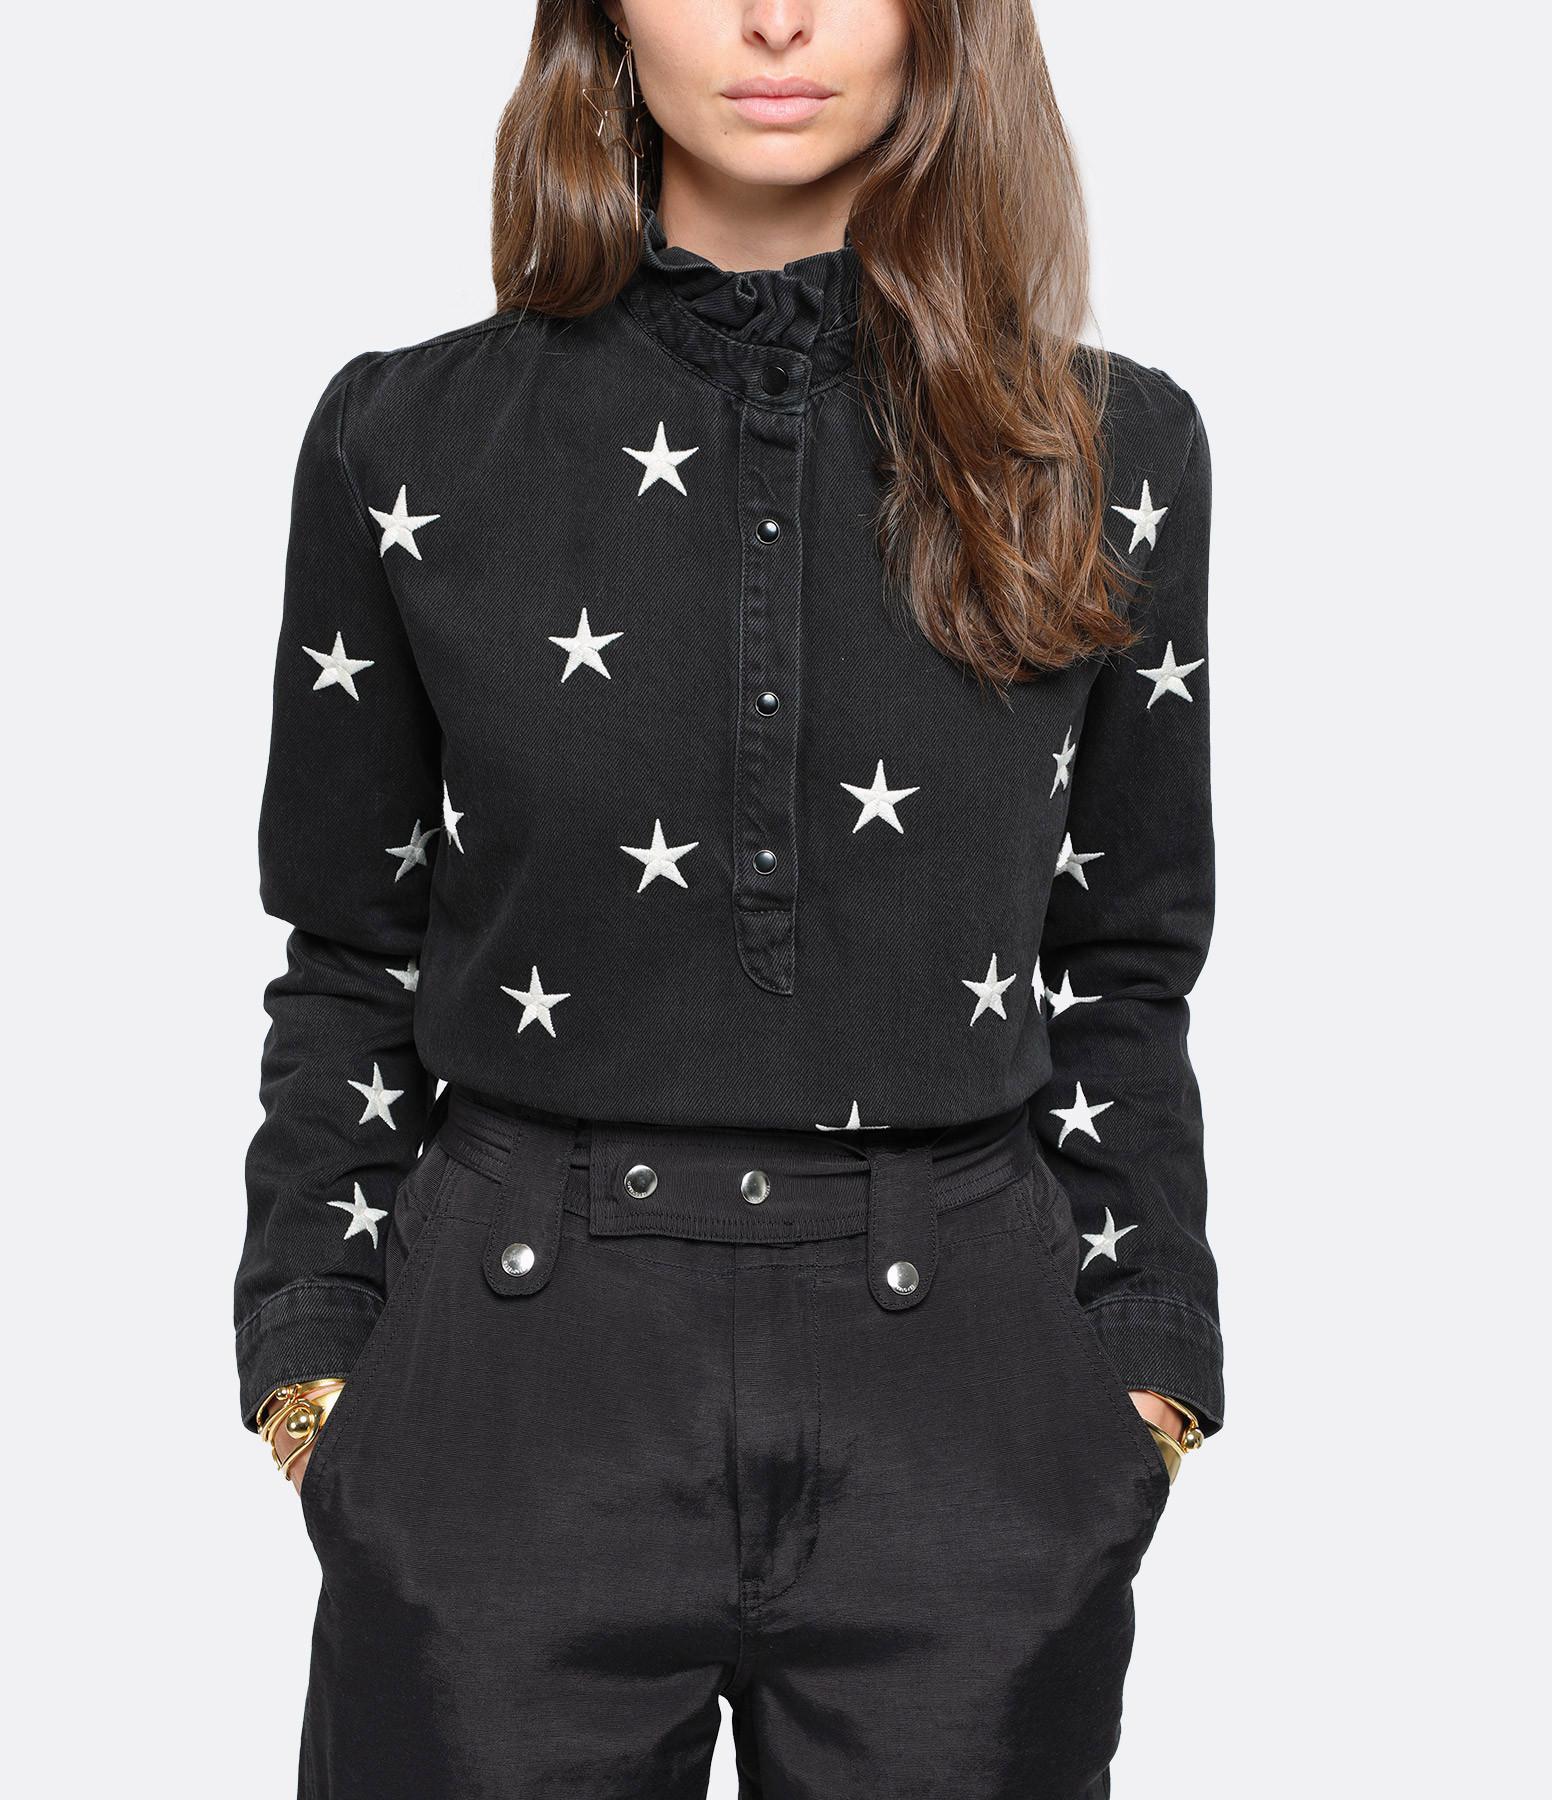 ONE TEASPOON - Chemise Ruffle Stars Noir